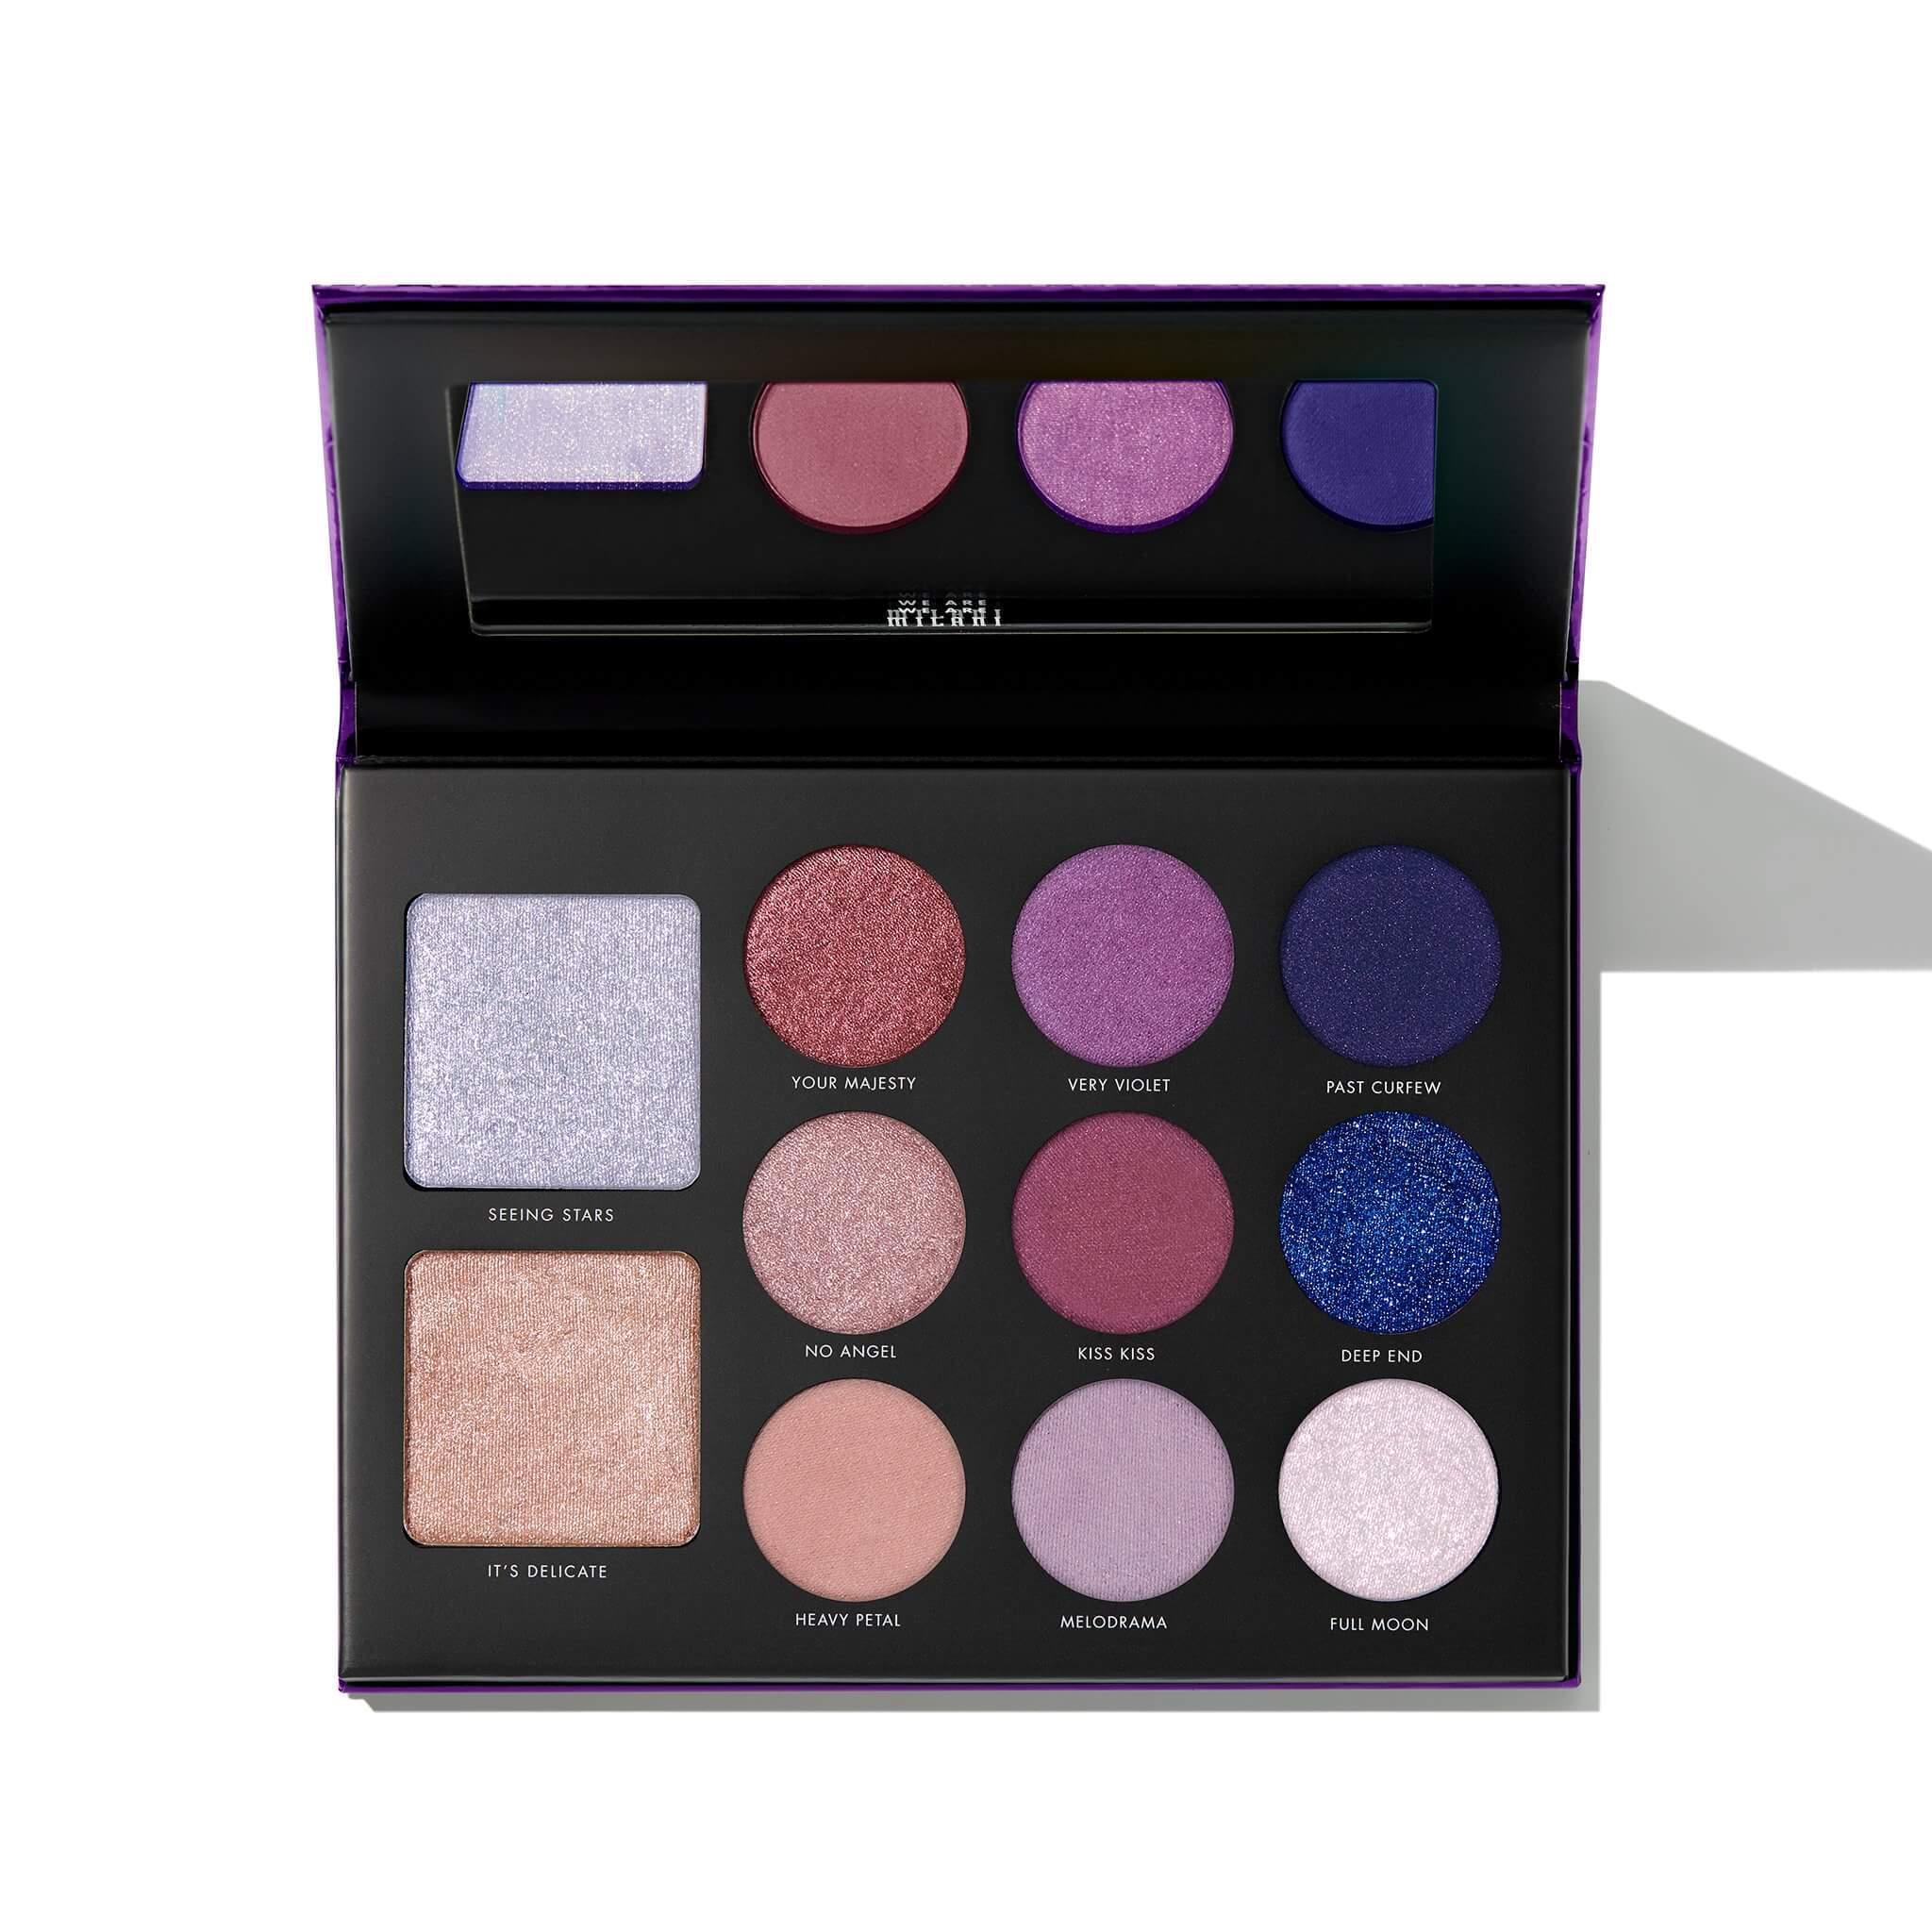 Gilded Violet Eyeshadow Palette